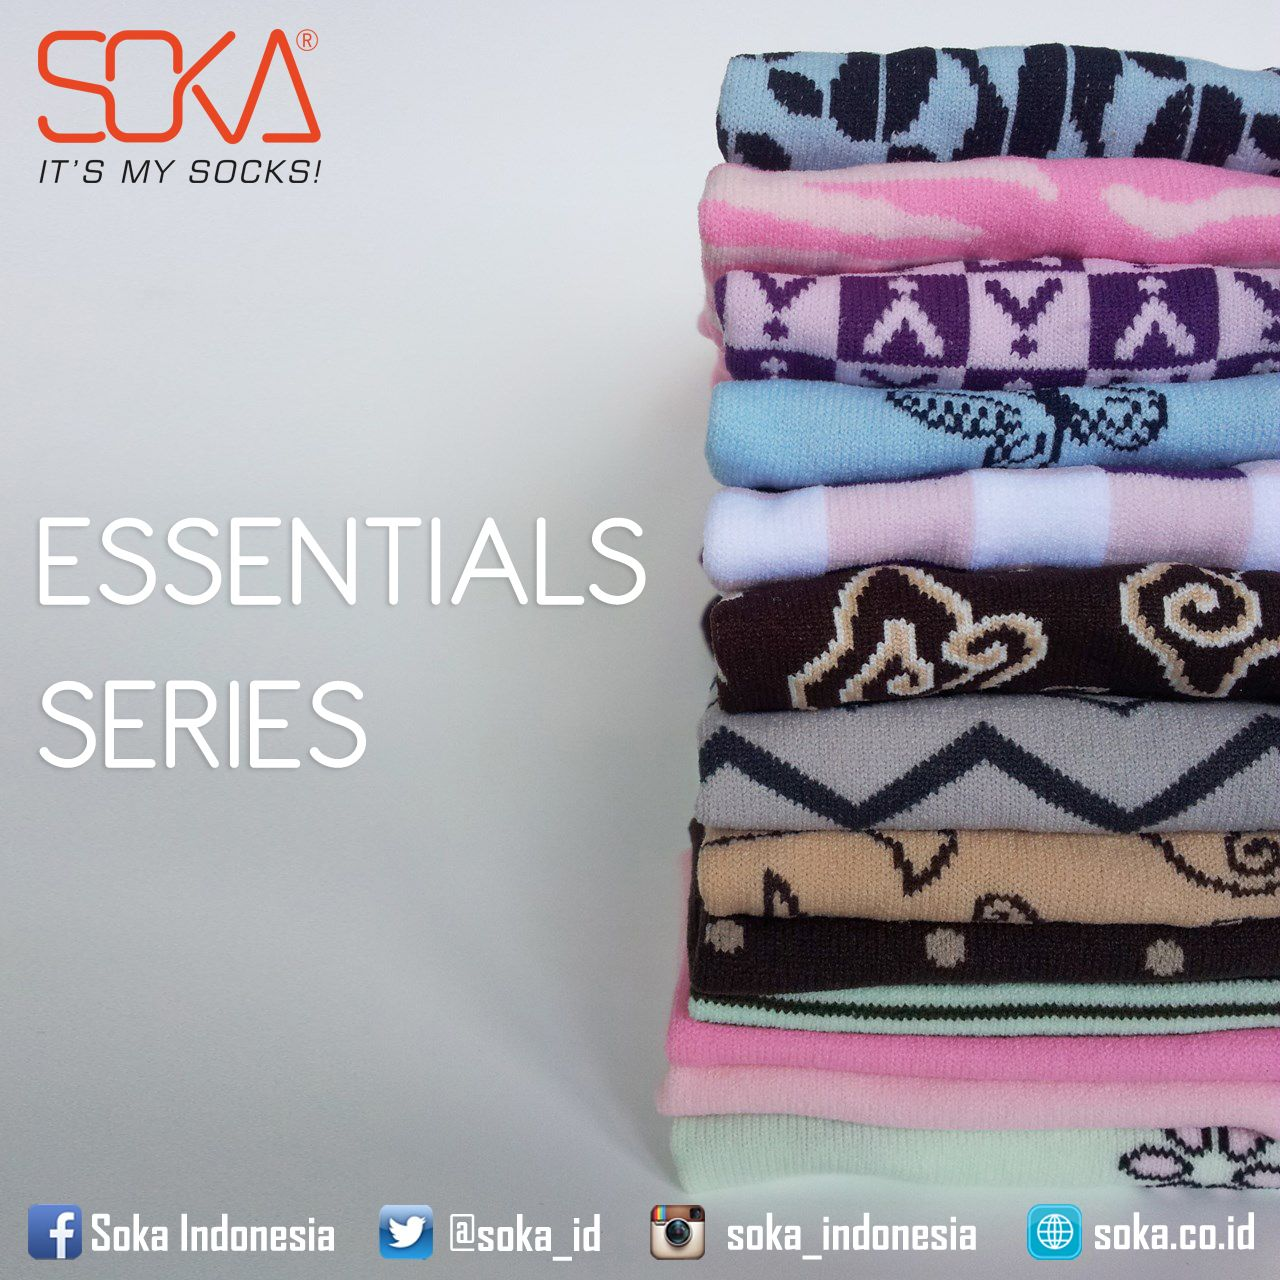 Essentials Series Soka